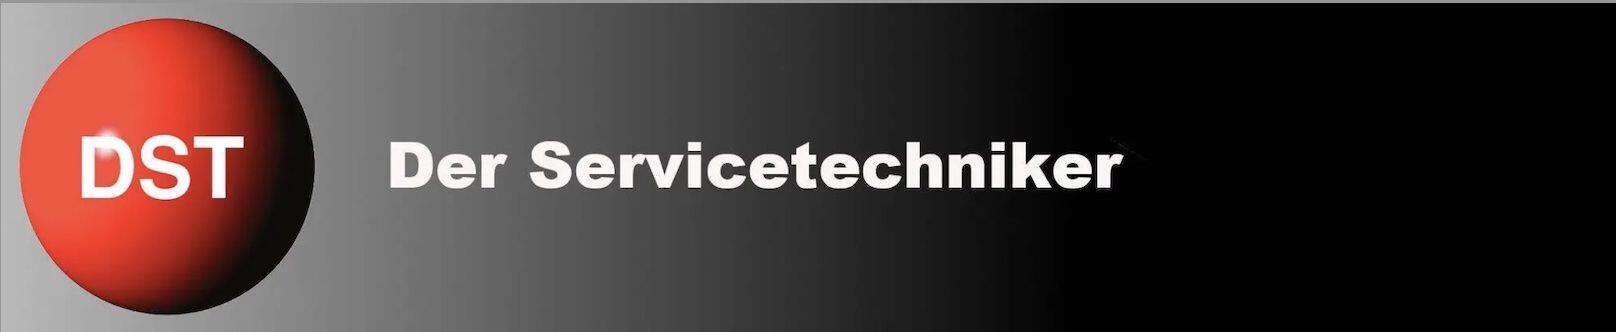 Der-Servicetechniker Logo